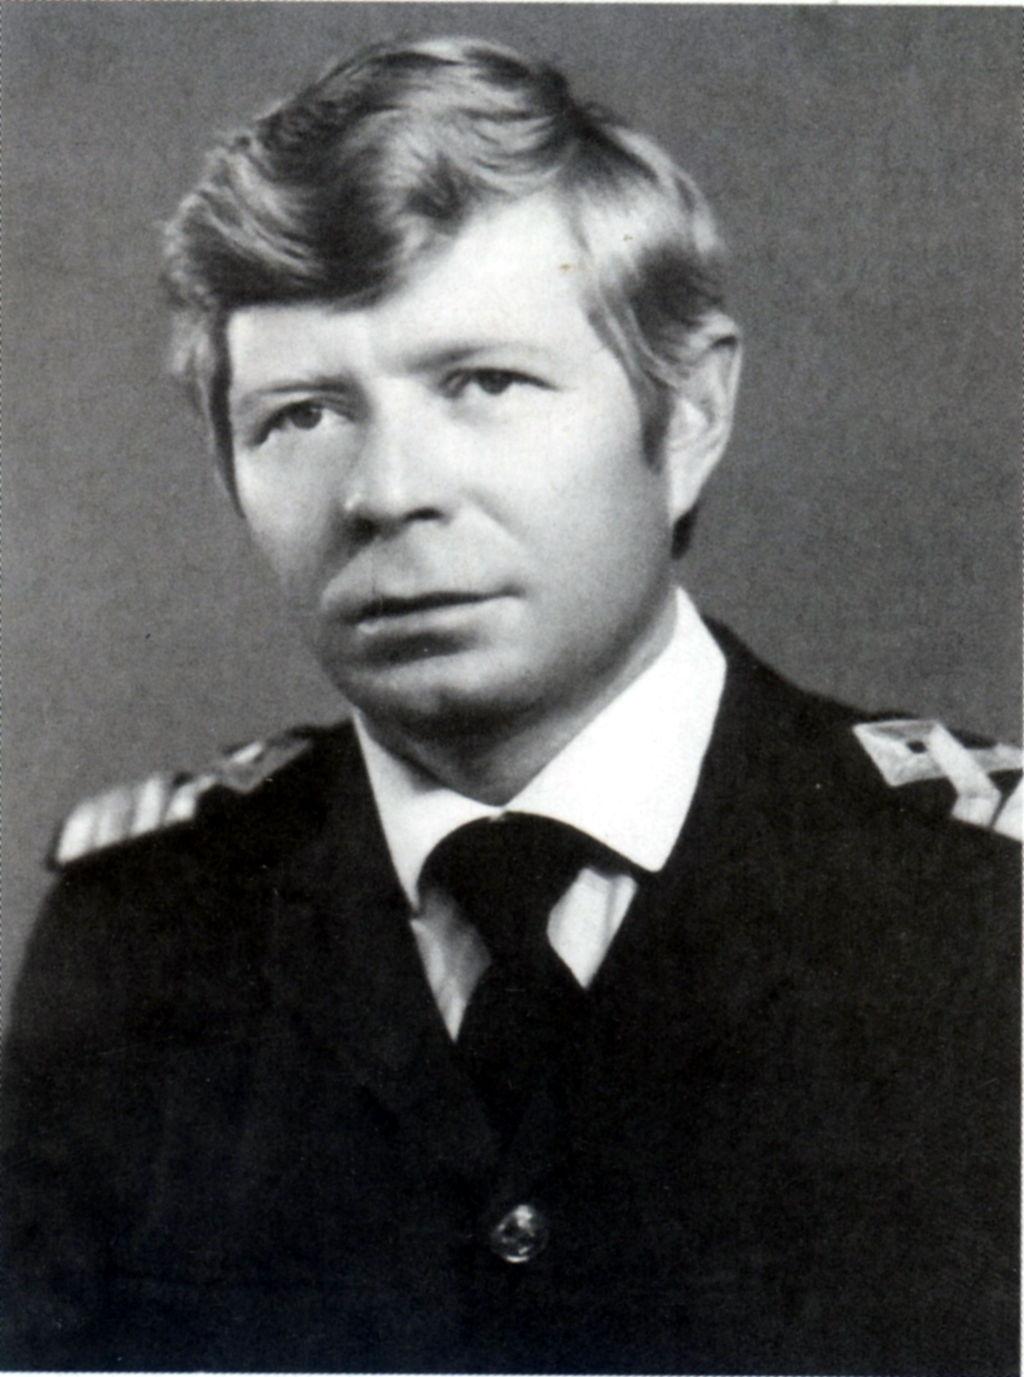 Кочергин Анатолий Михайлович